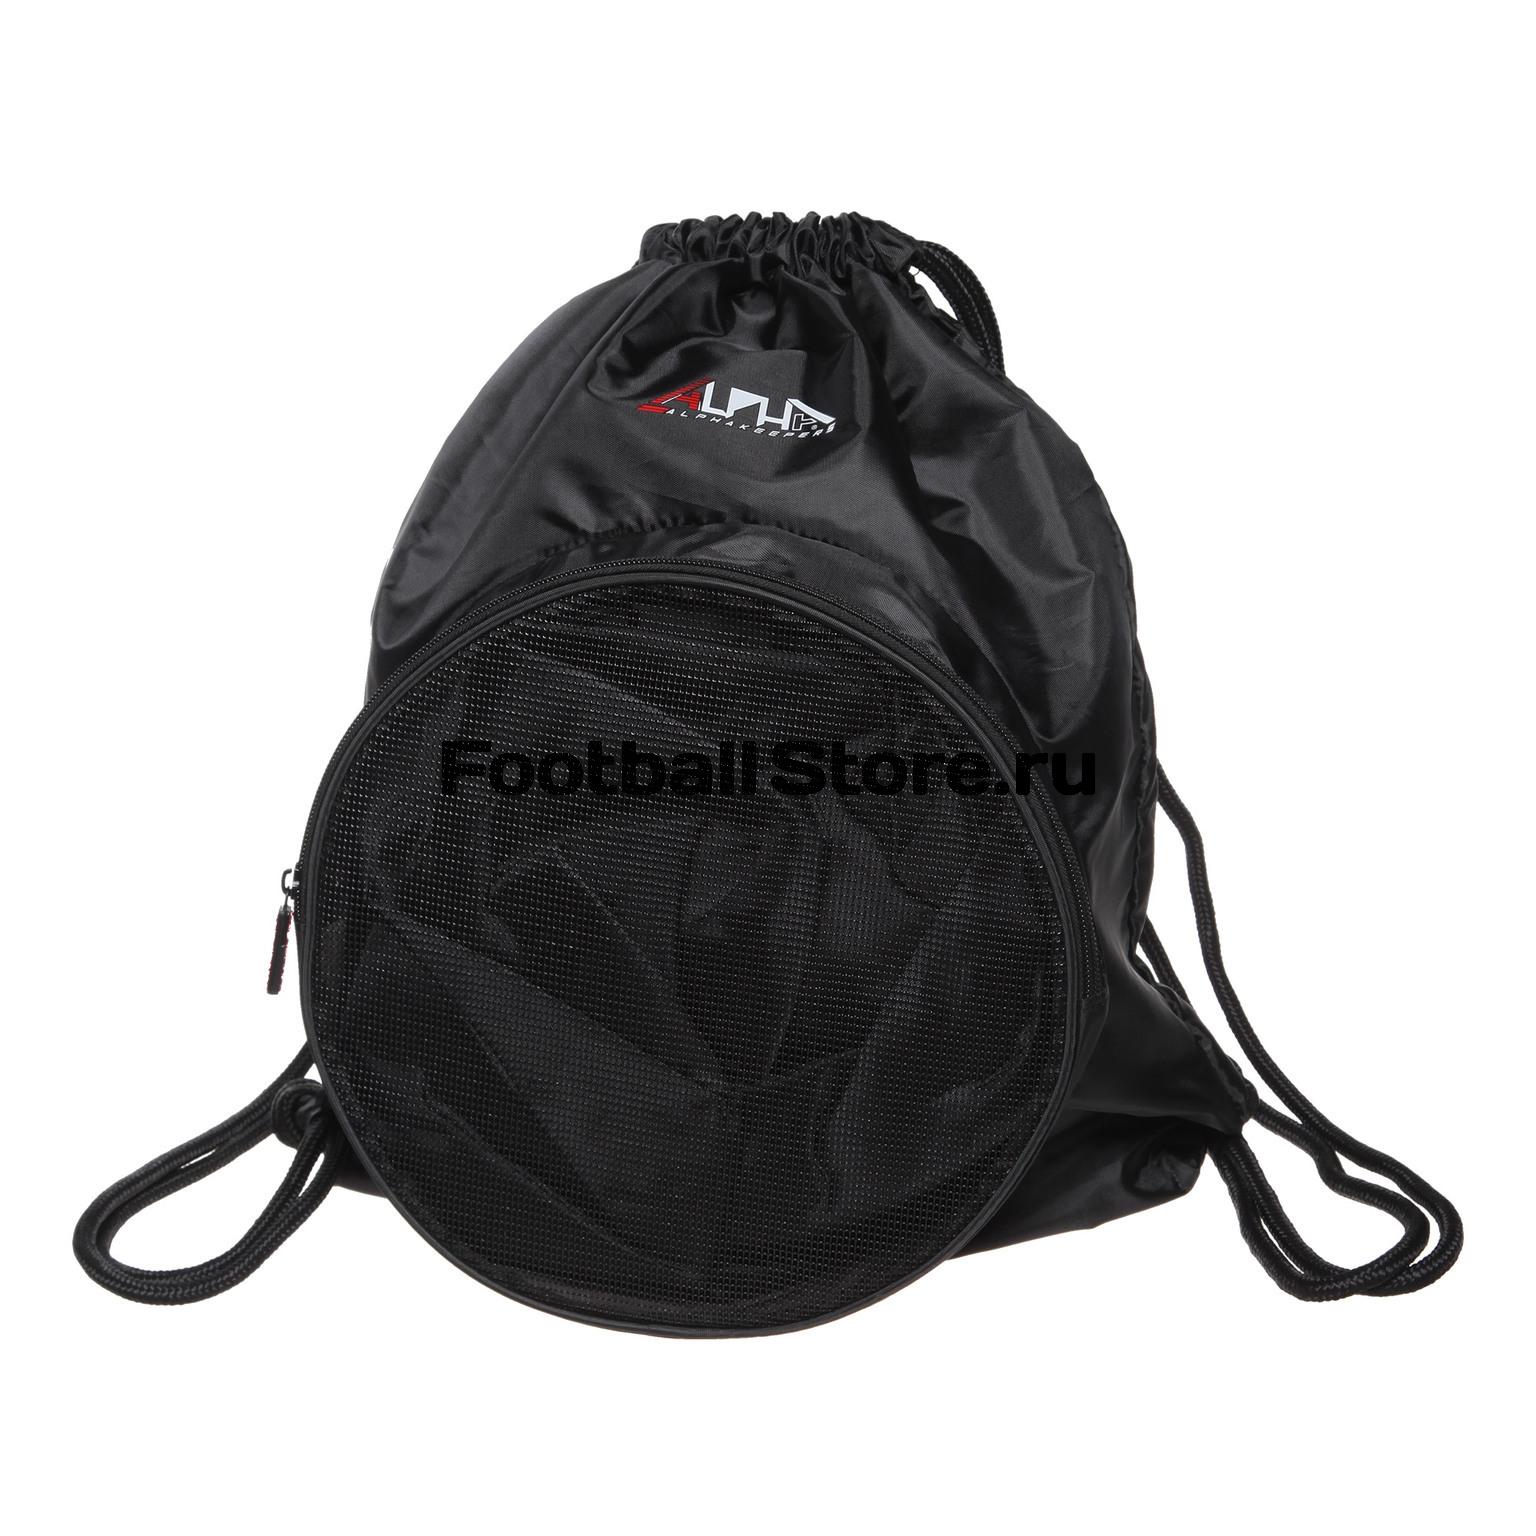 1181278bde50 Рюкзак-сумка Alpha Keepers Ball Match 9230 – купить в интернет магазине  footballstore, цена, фото